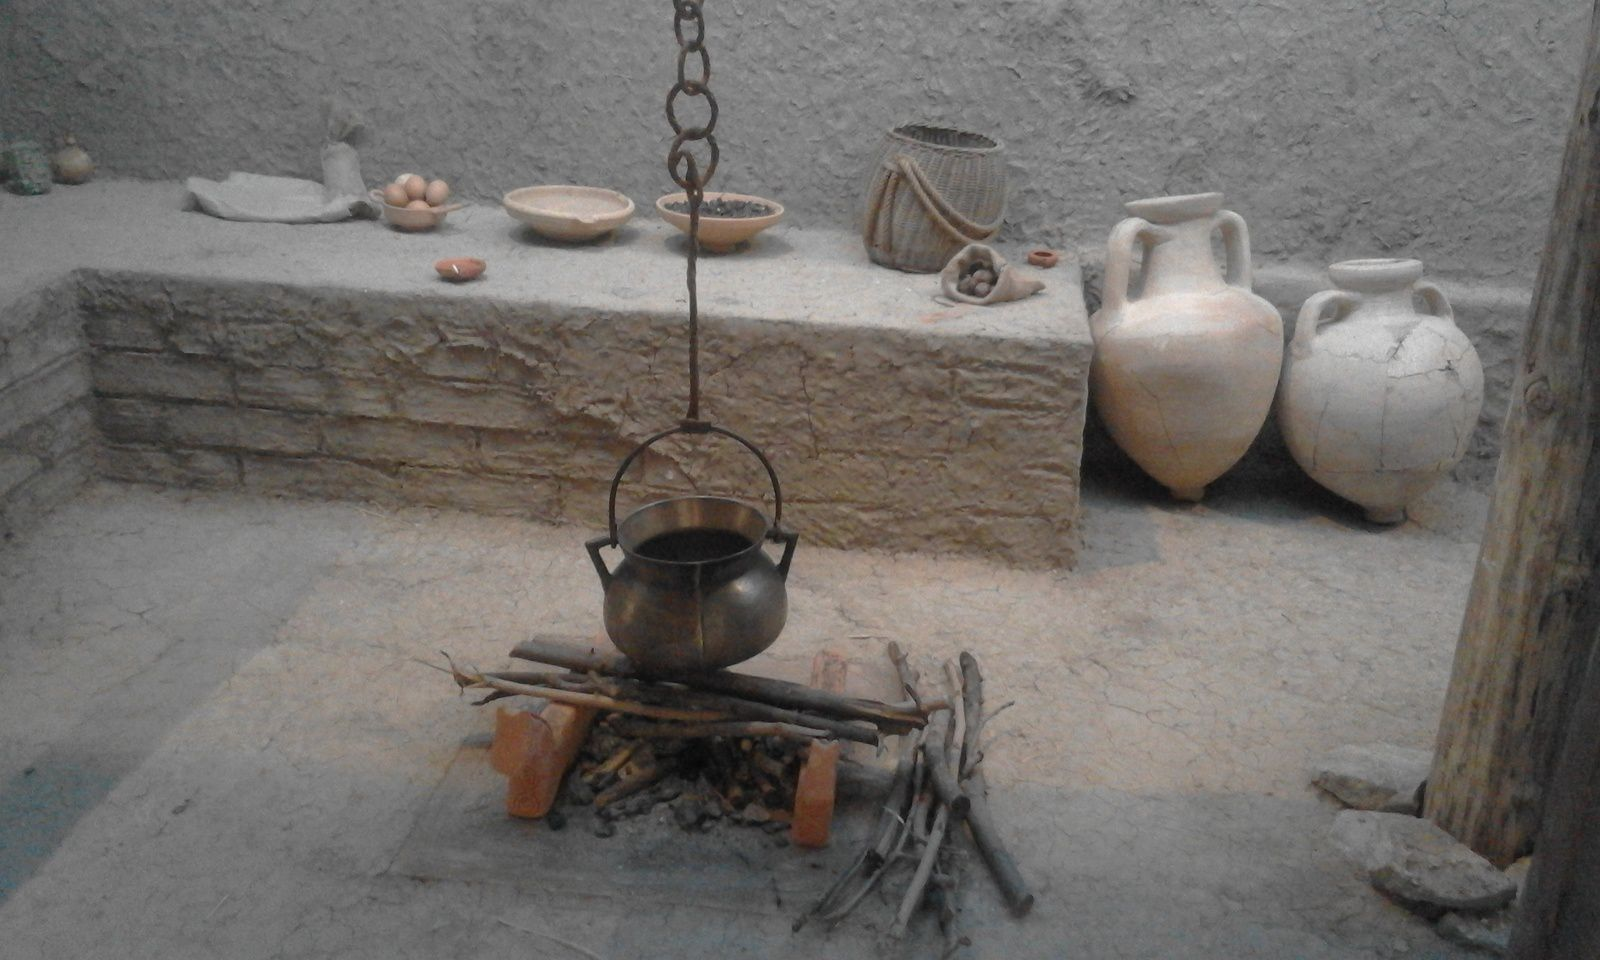 visite de l'expo et du musée Lattara en novembre 2018